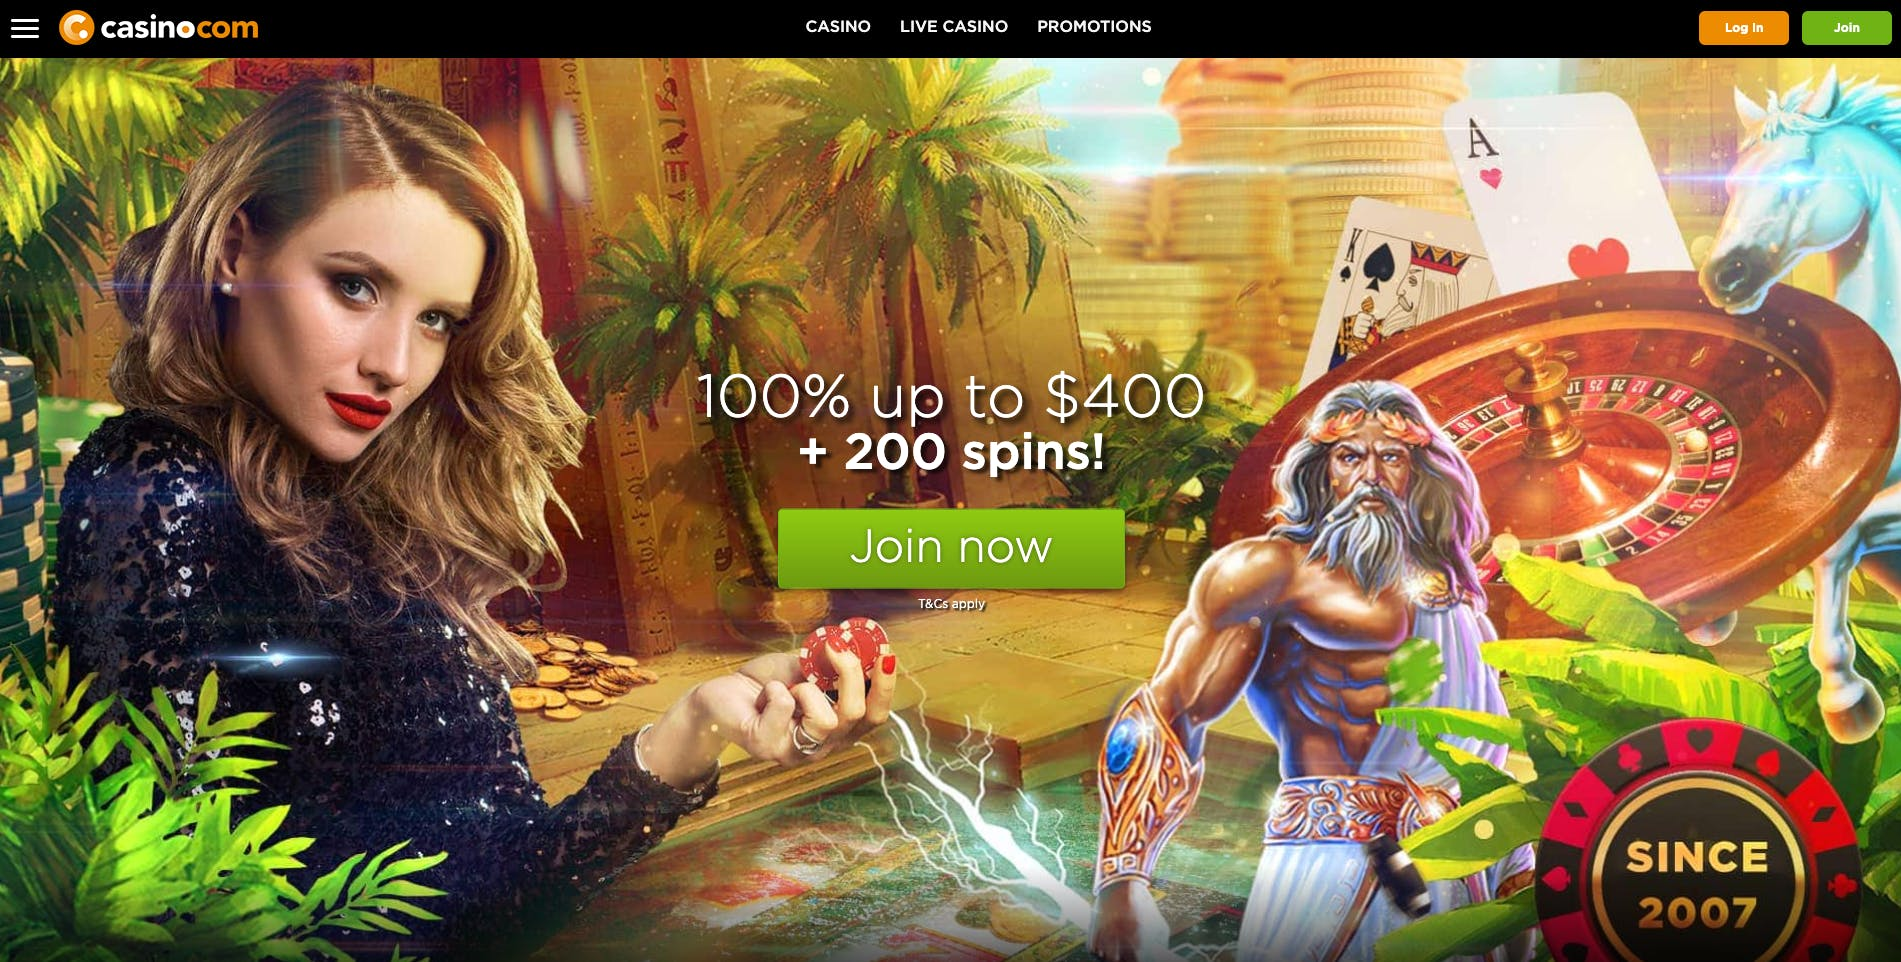 casino.com landing page